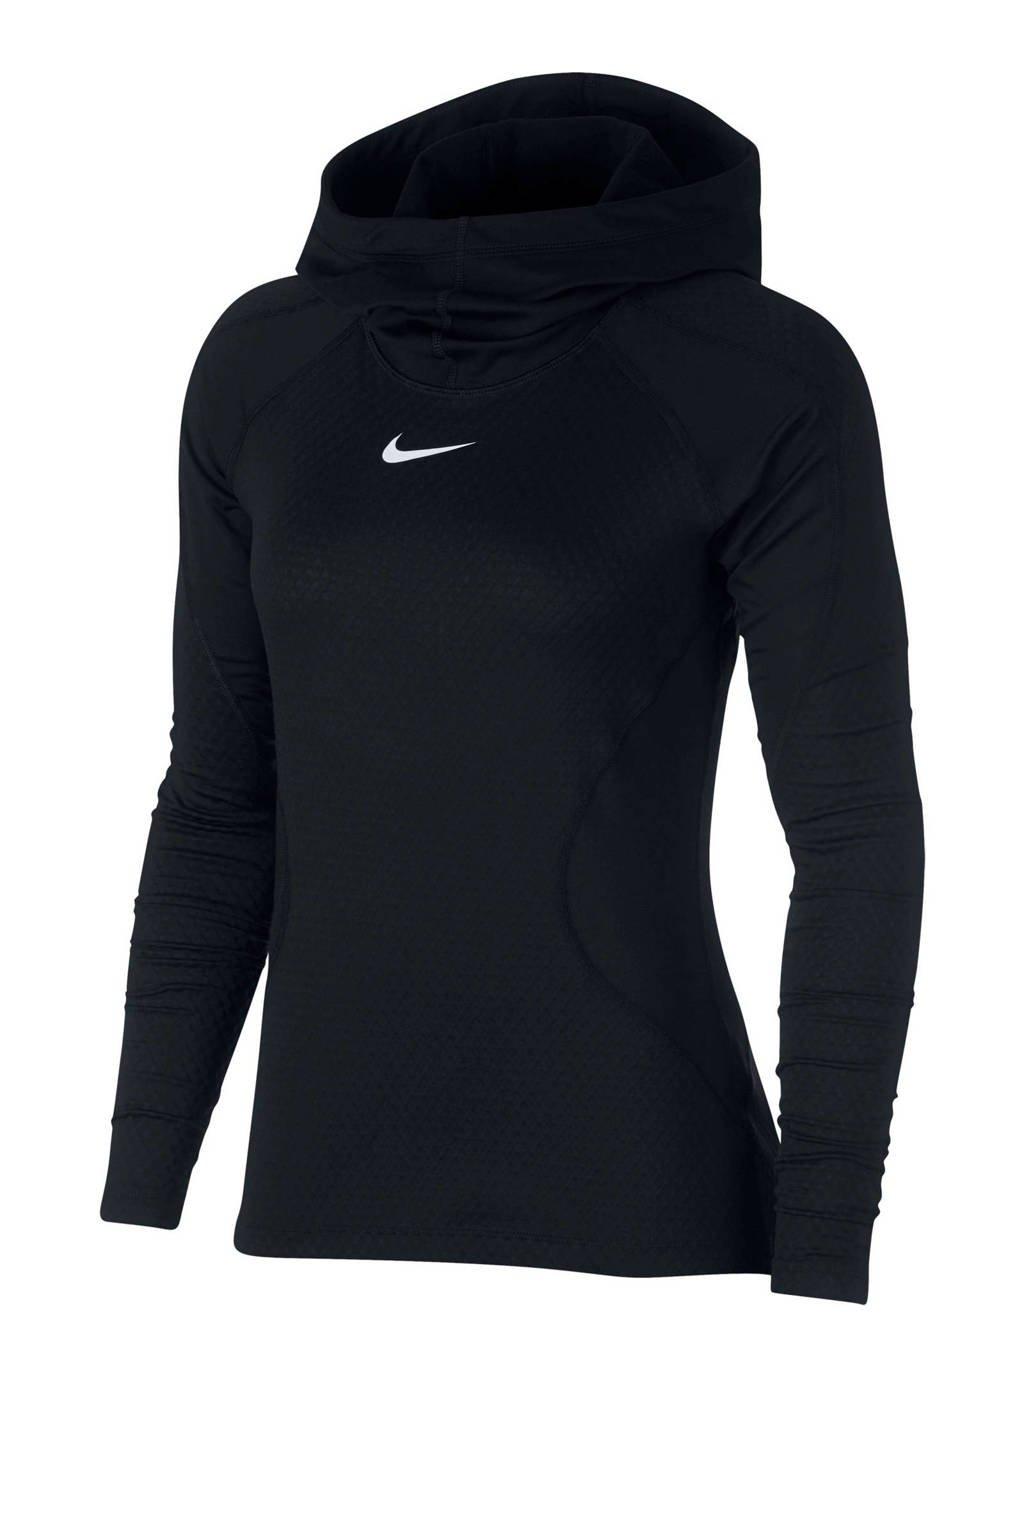 Nike Pro HyperWarm sportsweater zwart, Zwart